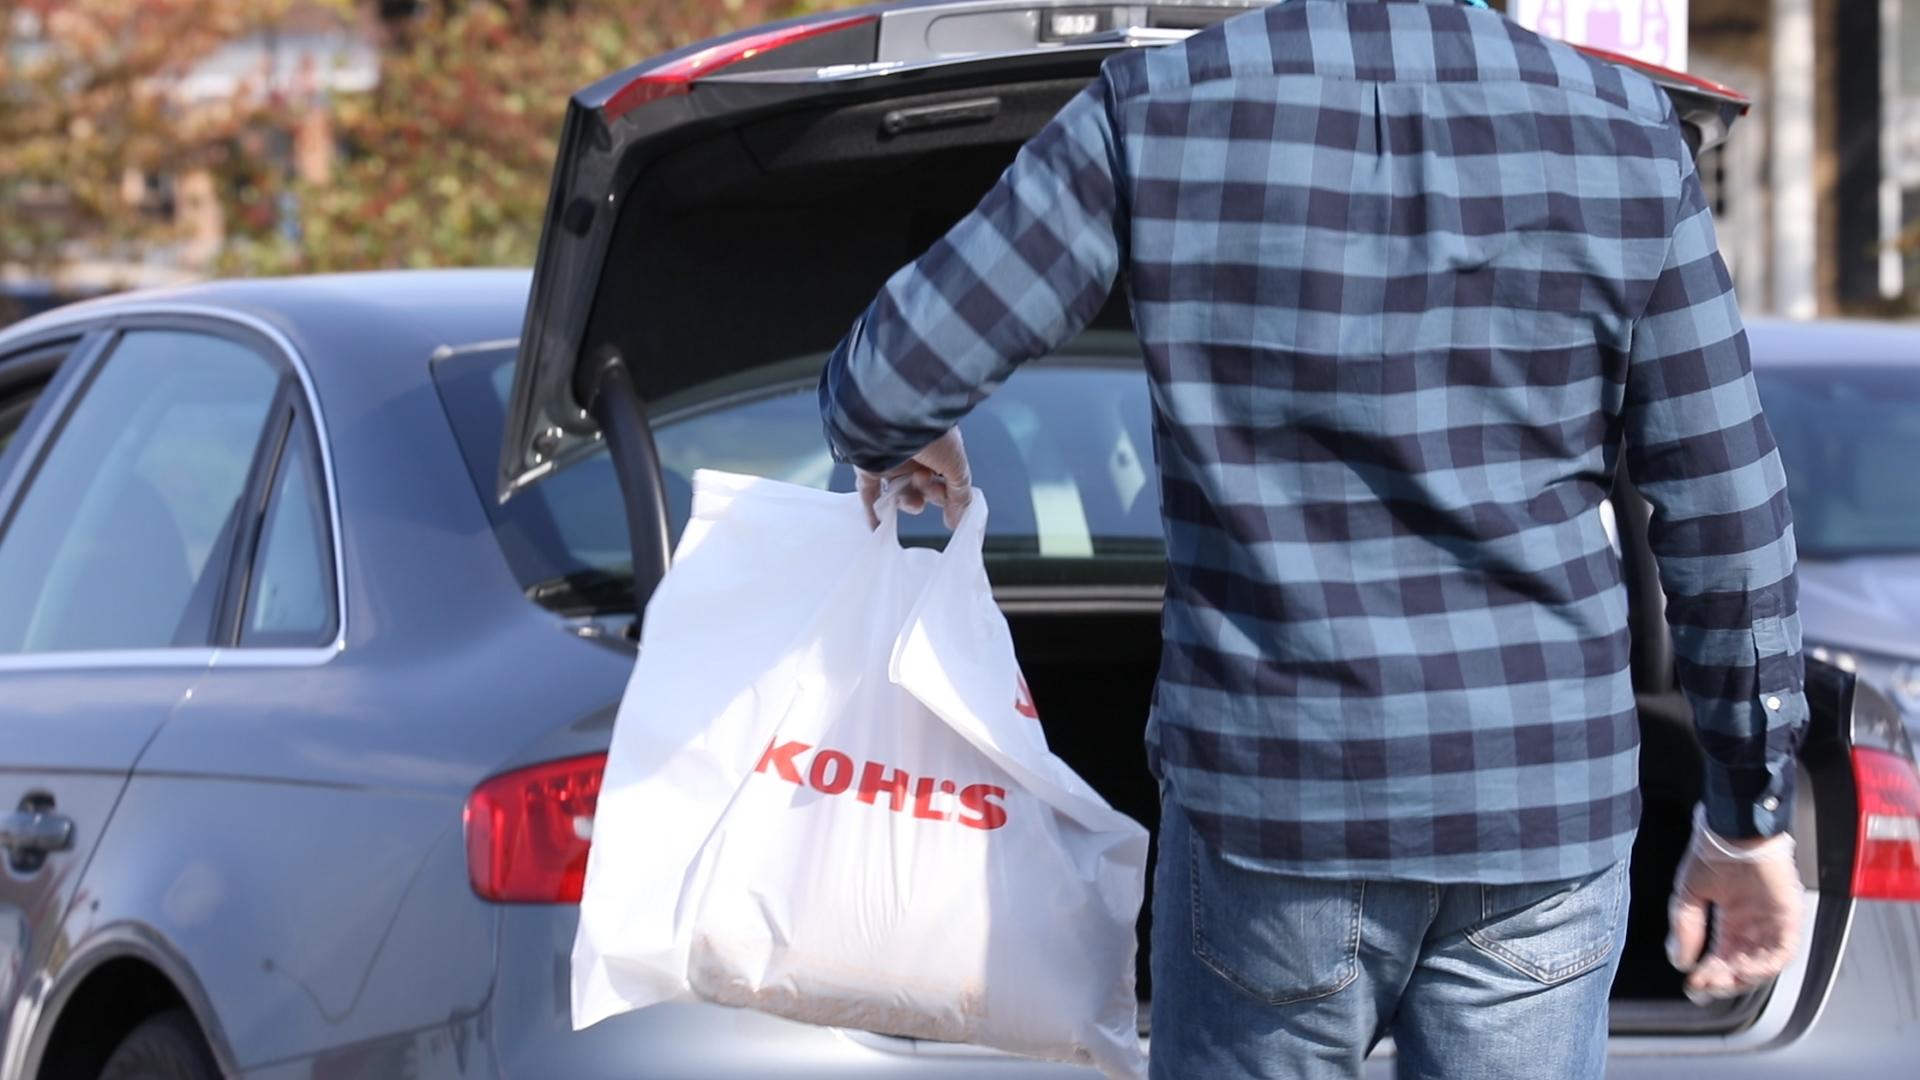 shopper taking kohl's shopping bag to car